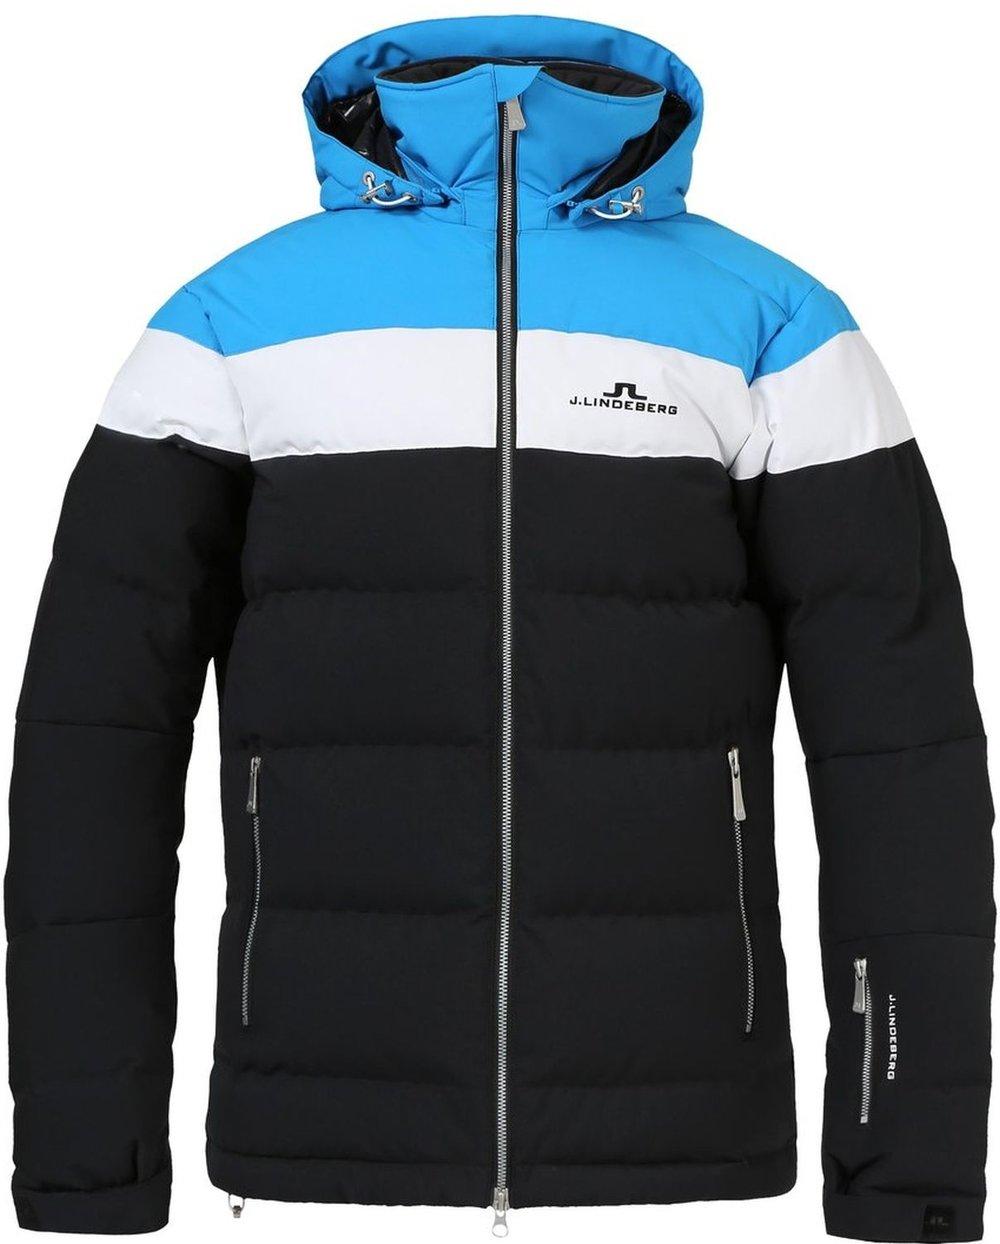 J.Lindeberg Crillon Down JL 2L Jacket, £465